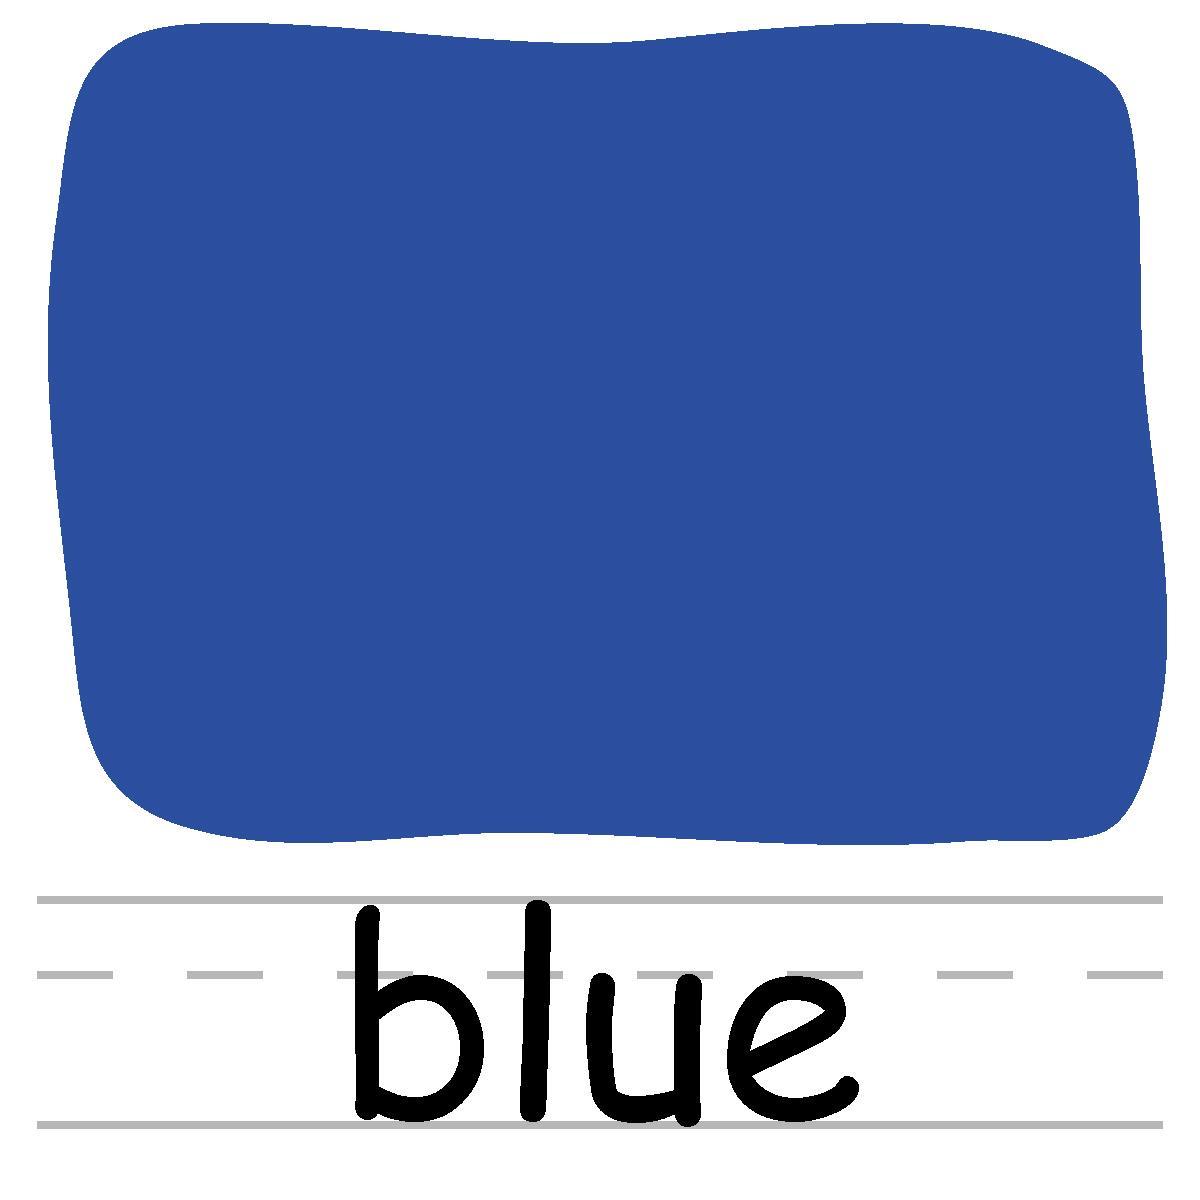 Blue clipart. Clip art x panda